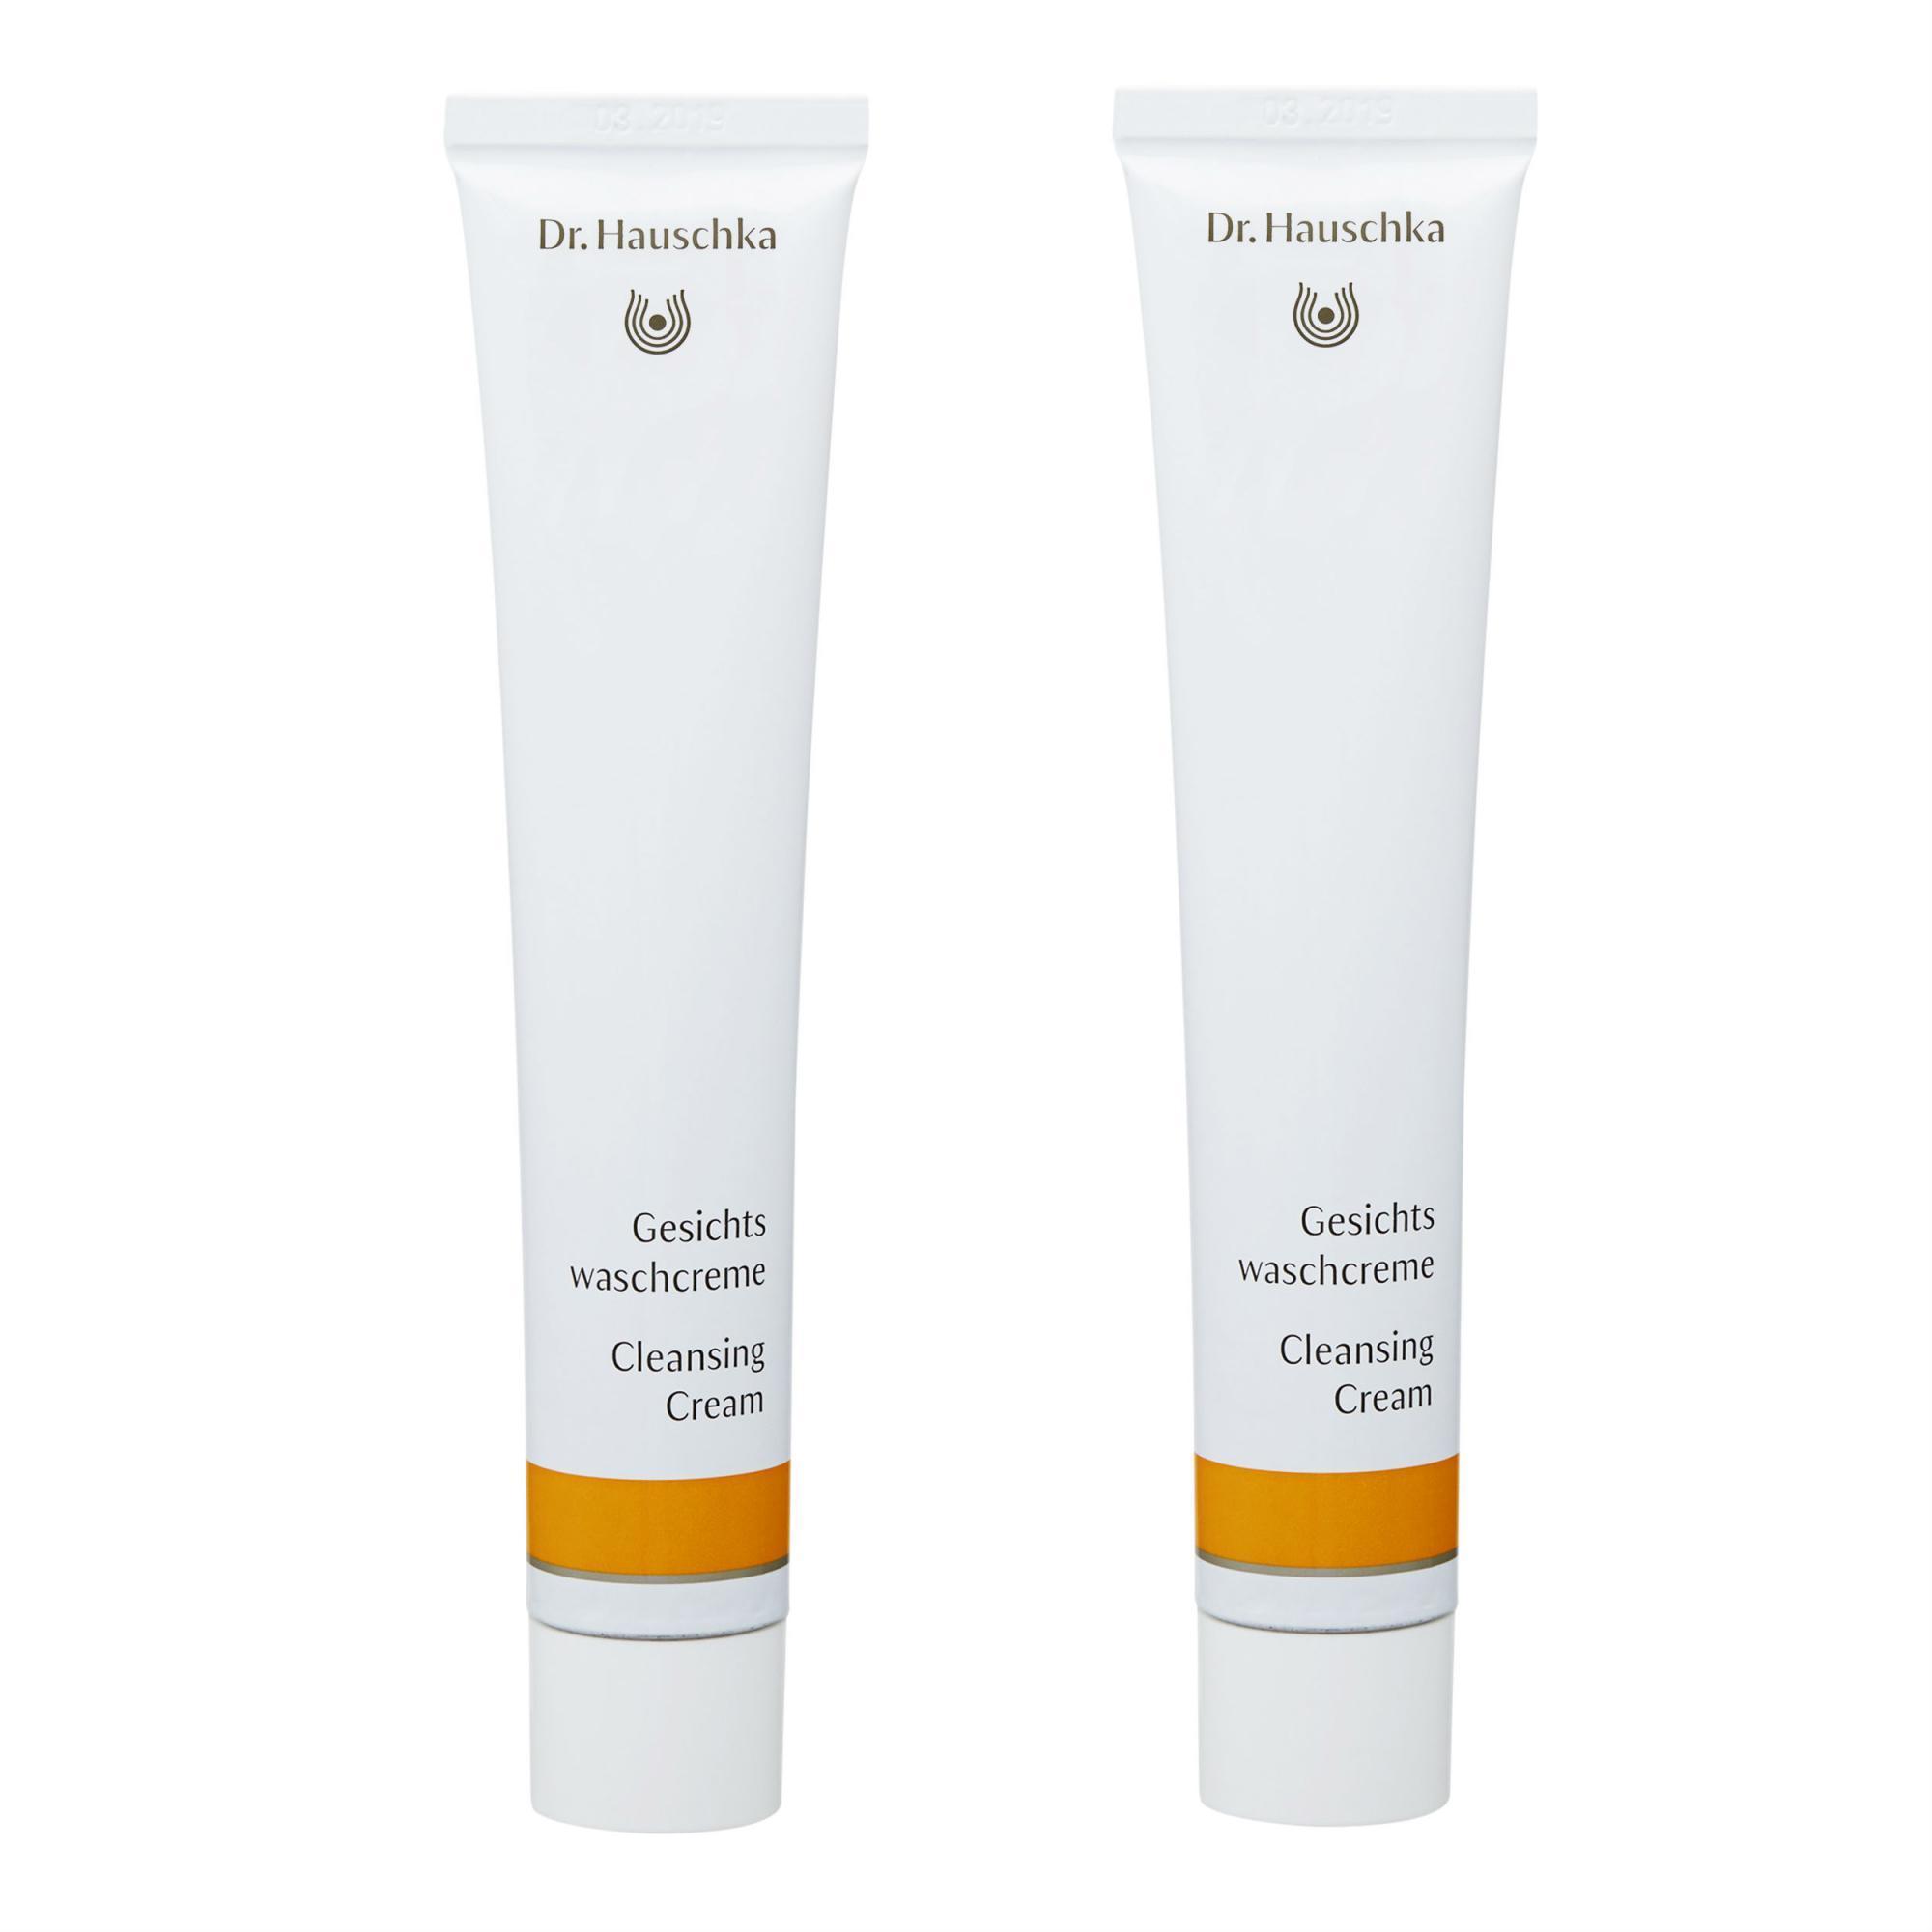 Sales Price Dr Hauschka Cleansing Cream 50Ml 1 7Oz X 2 Intl